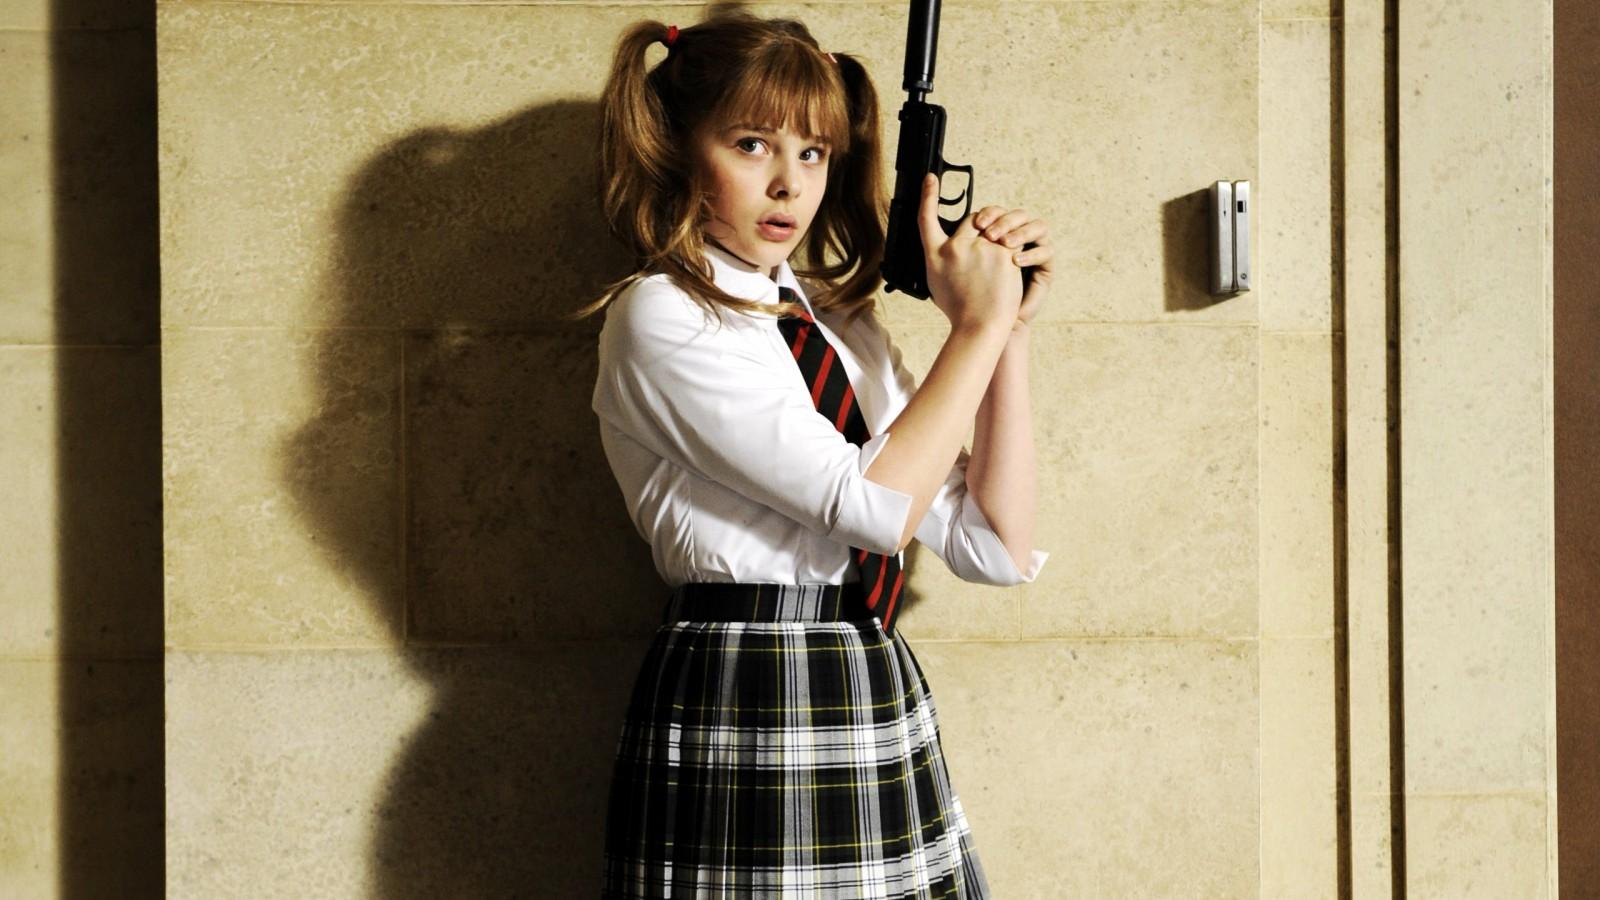 Girl Gun Desktop Wallpaper Chloe Moretz As Hit Girl In Kick Ass Wallpapers Hd